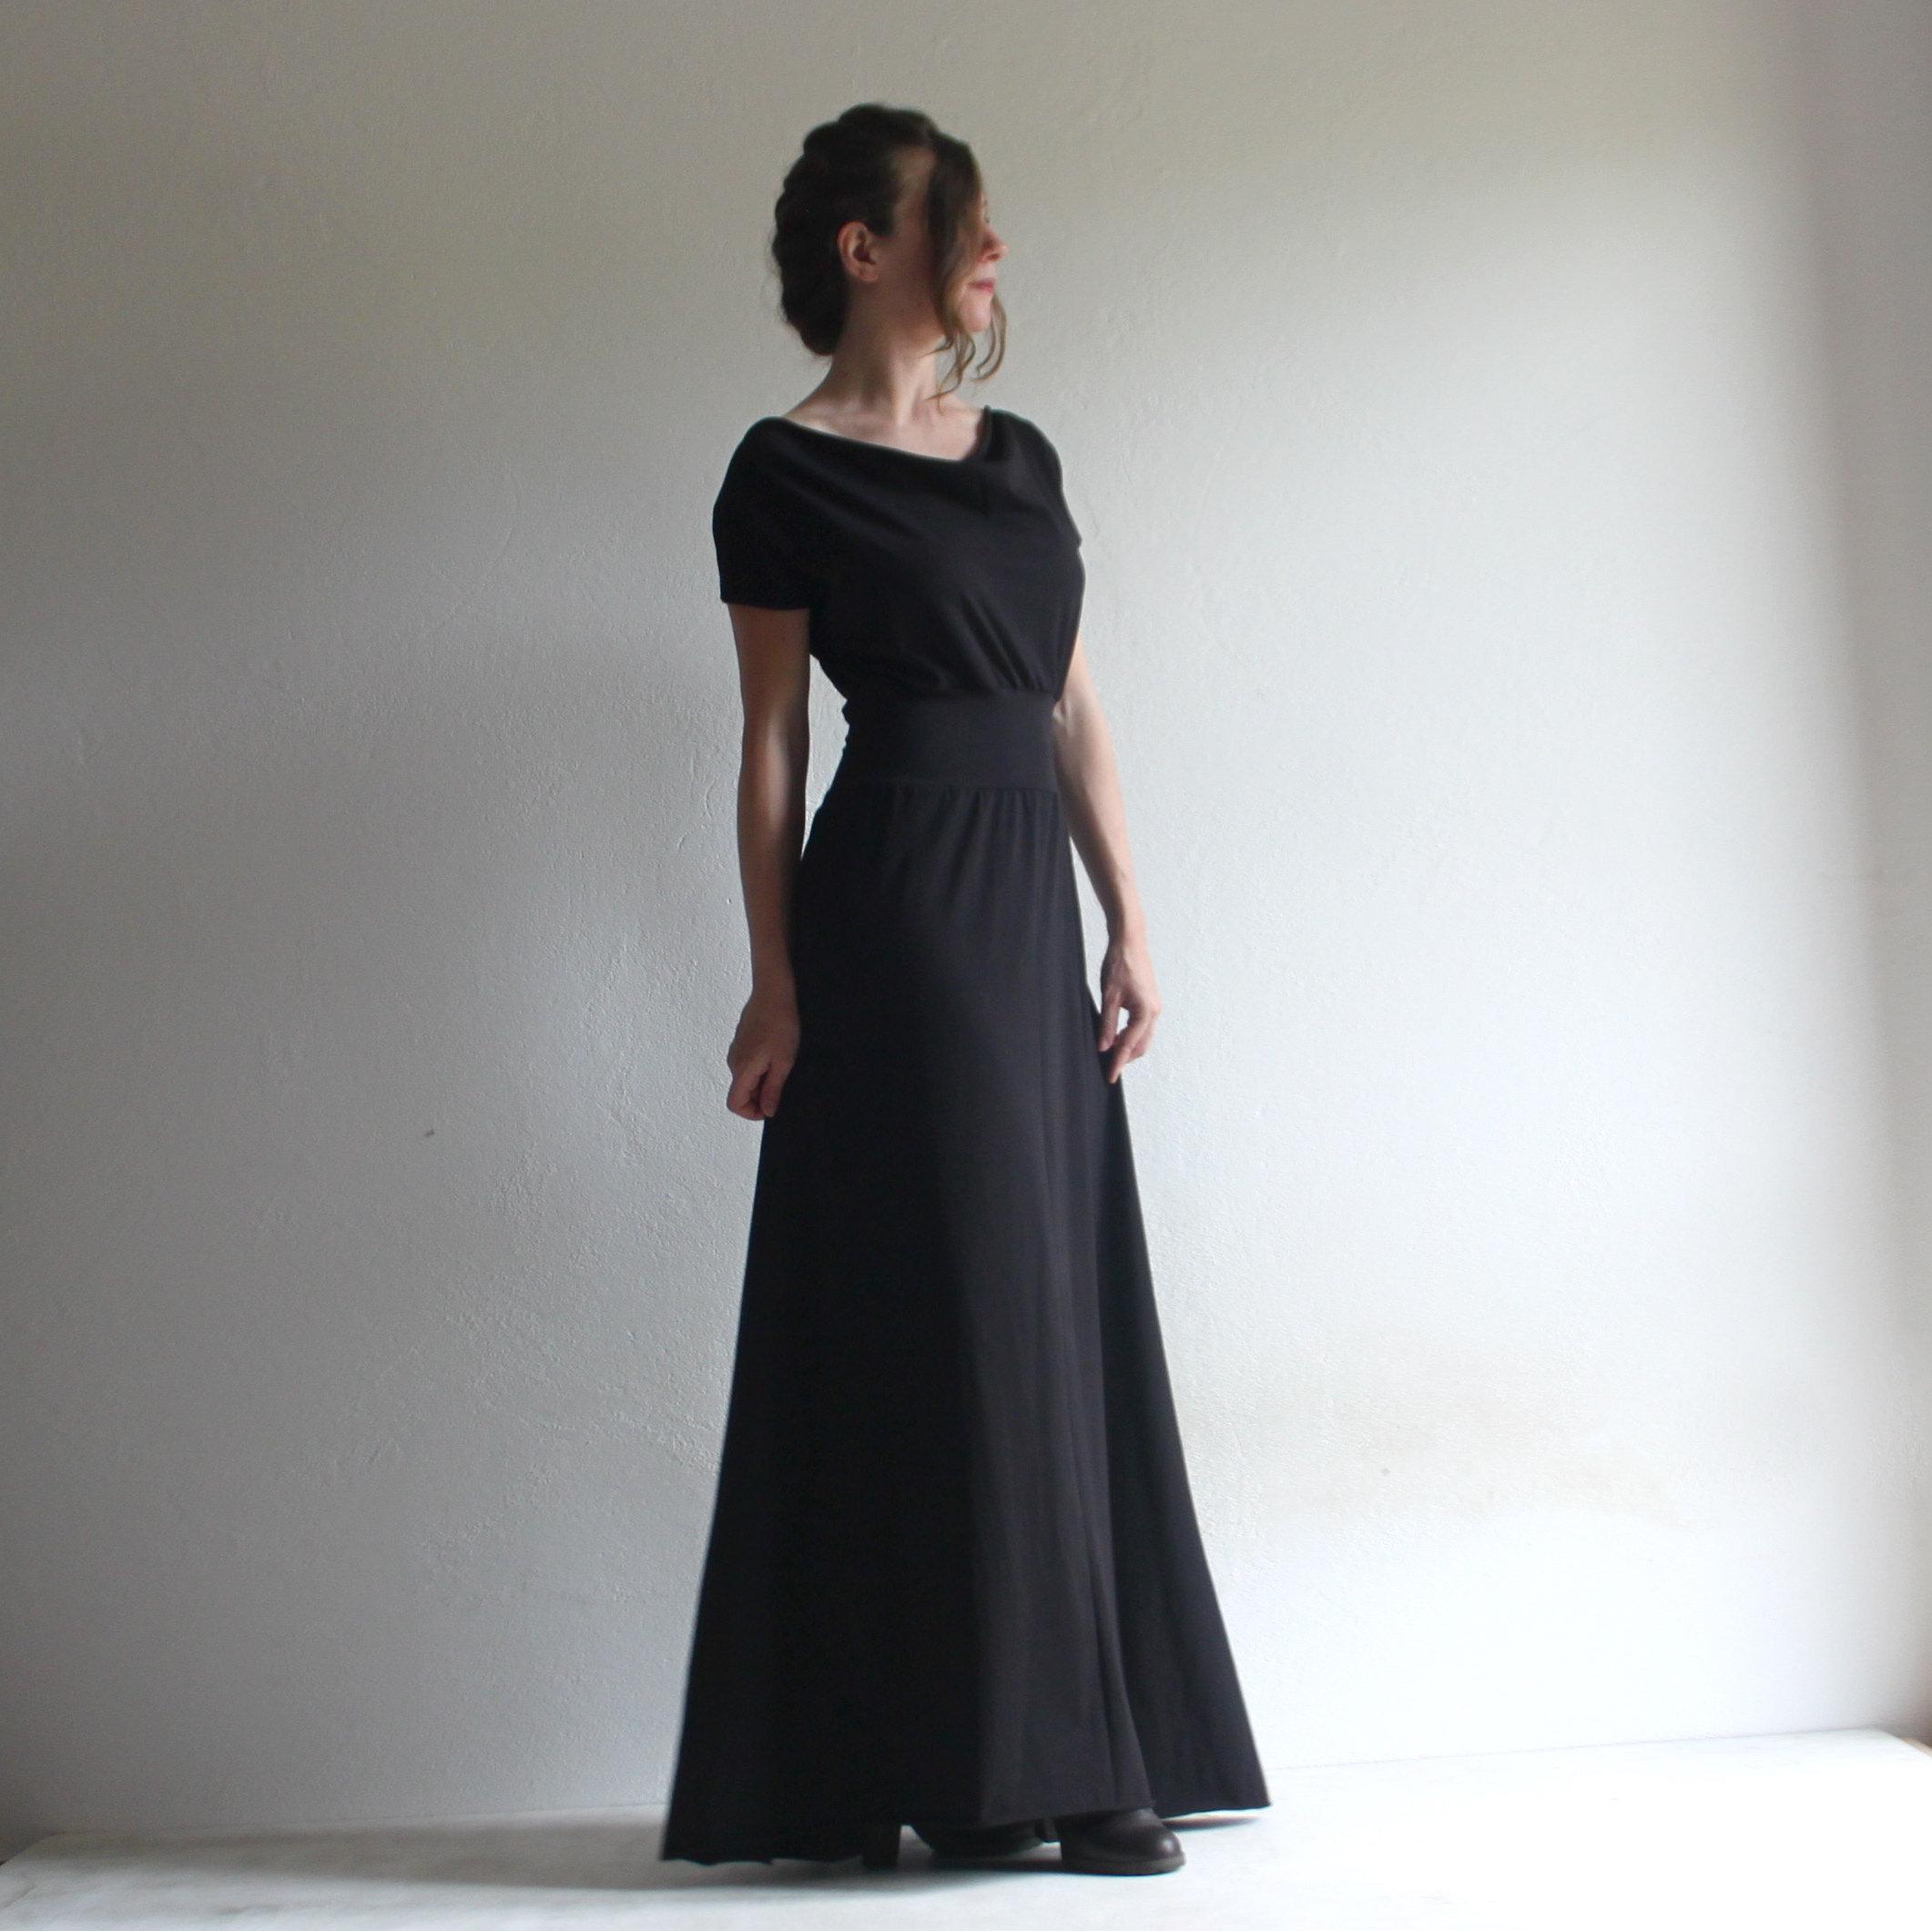 Long Dress Black Dress Draped Dress Winter Dress Short Sleeve Dress Draped Cowl Dress Pagan Dress Plus Size Clothing Petite Clothing Loretree